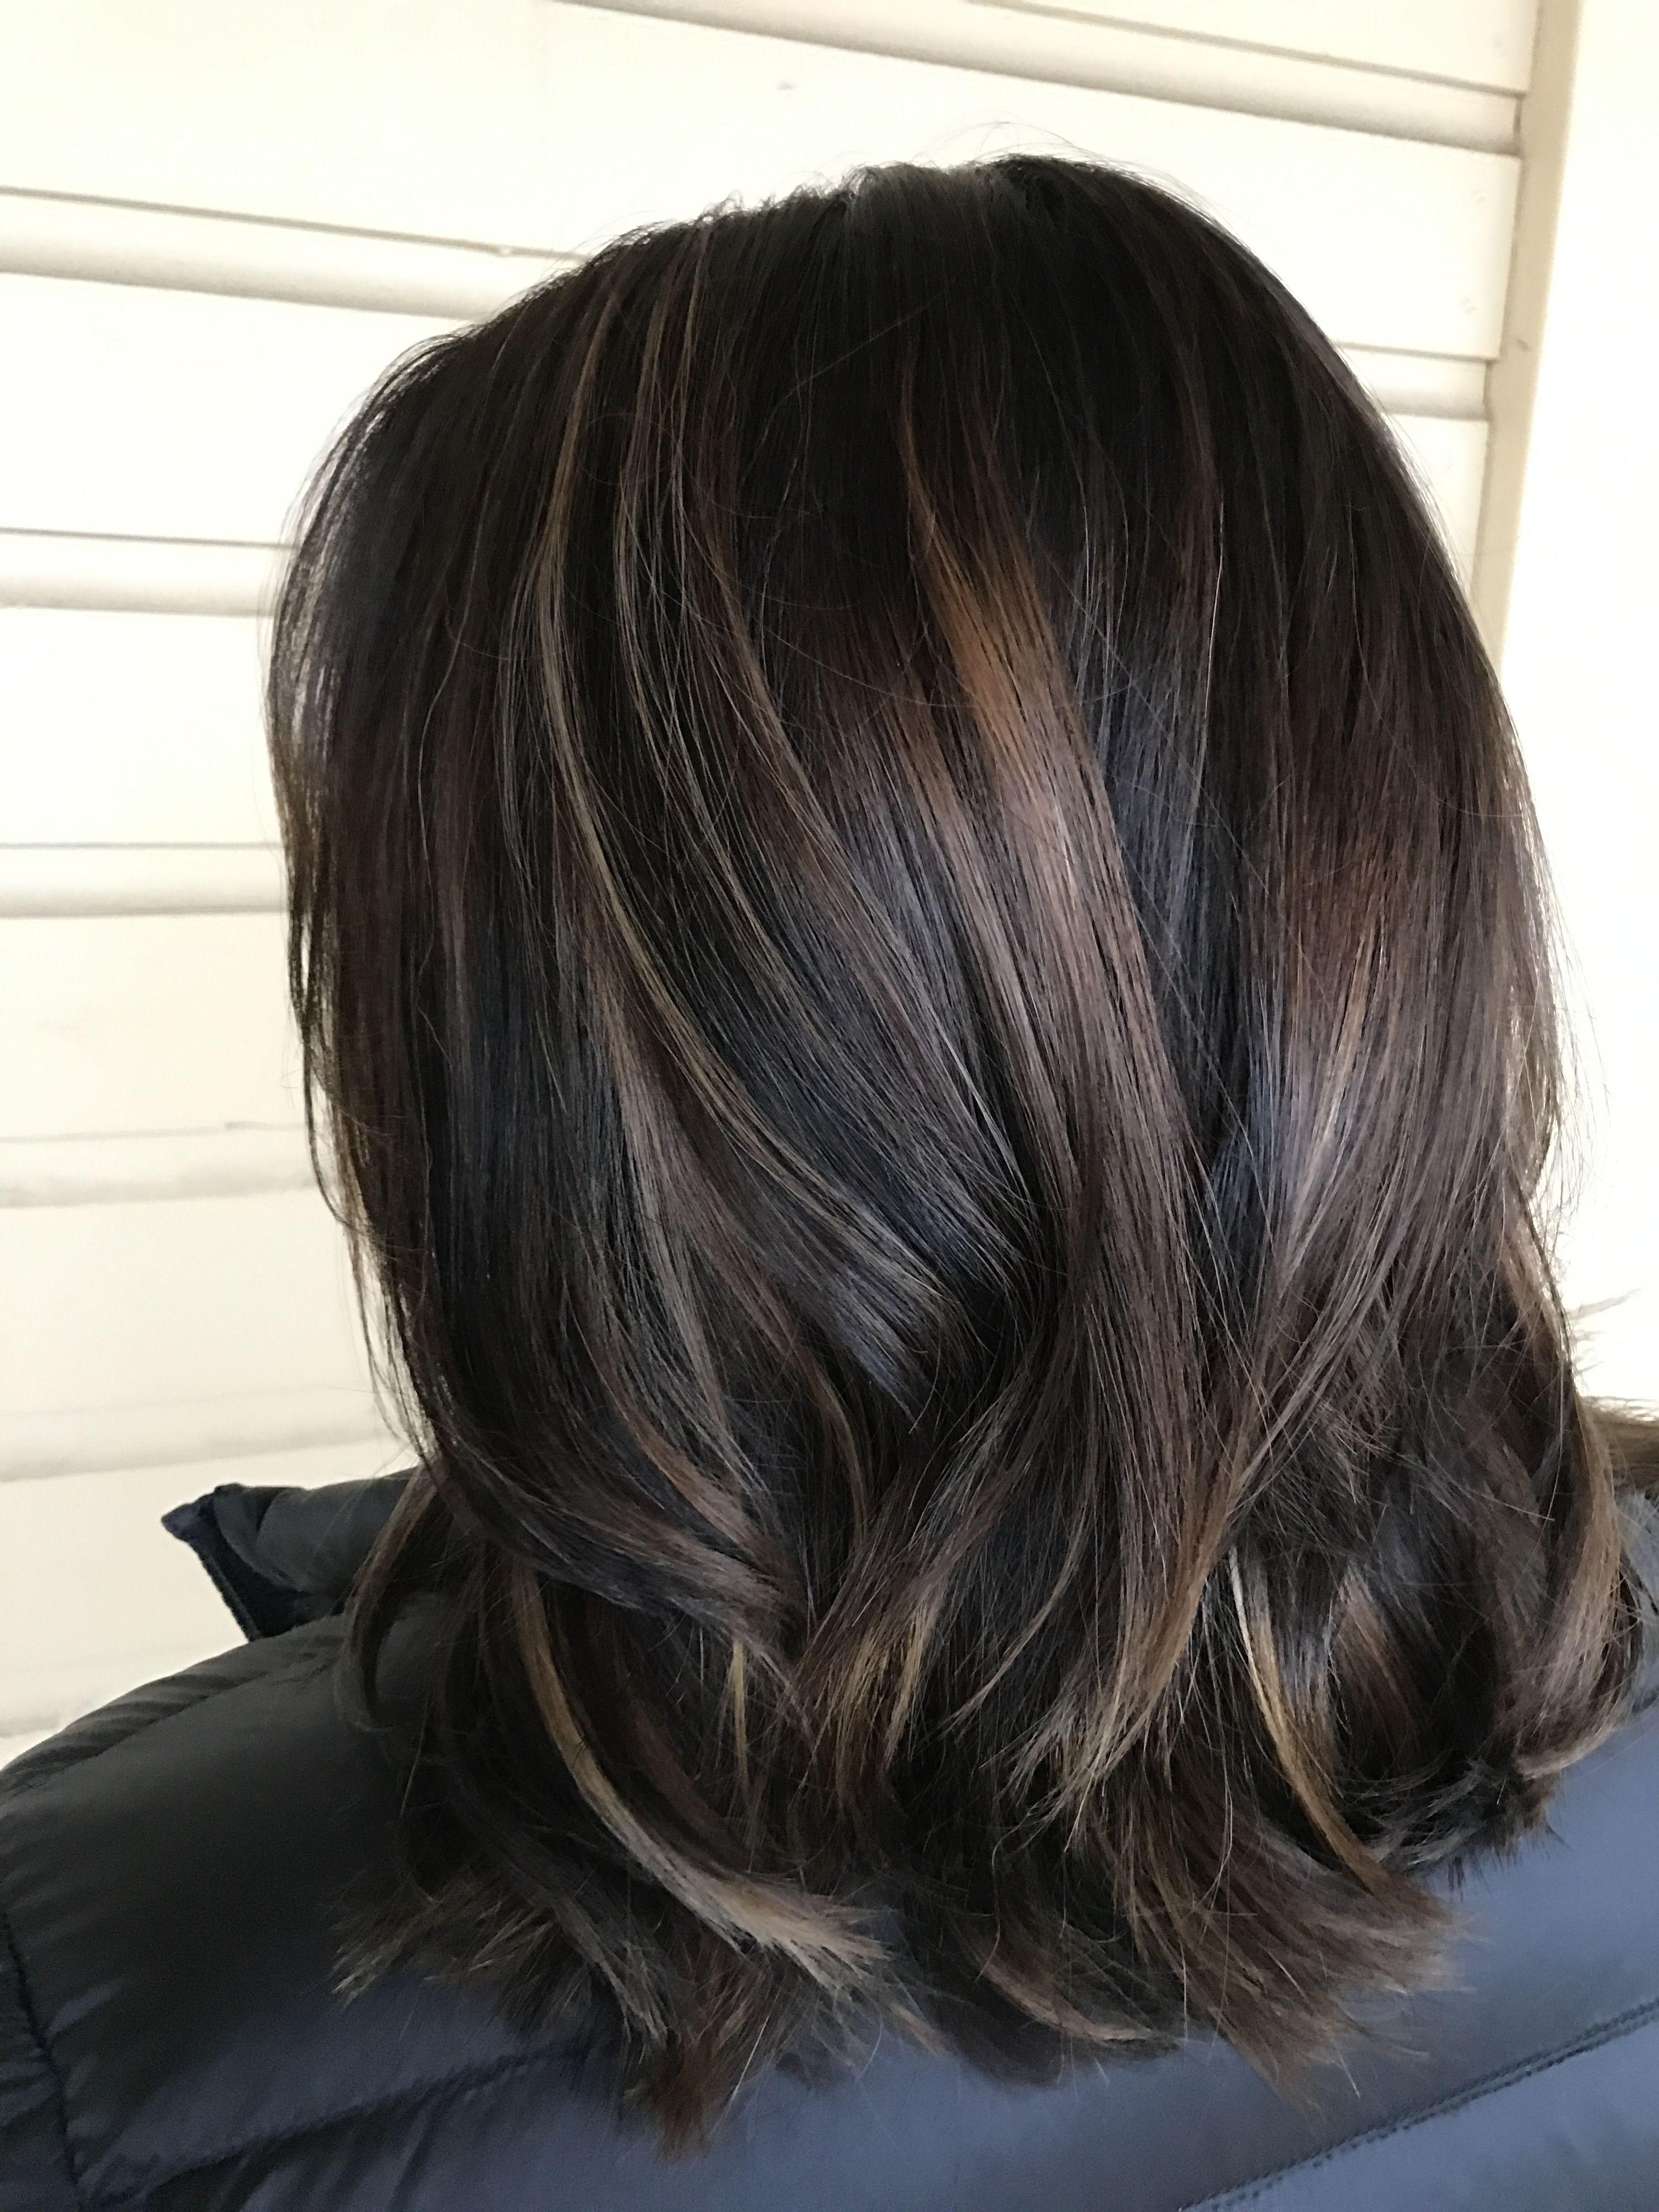 Balayage Dark Hair Caramel Balayage Hair Hair In 2019 Balayage Hair Caramel Hair Brown Hair Balayage